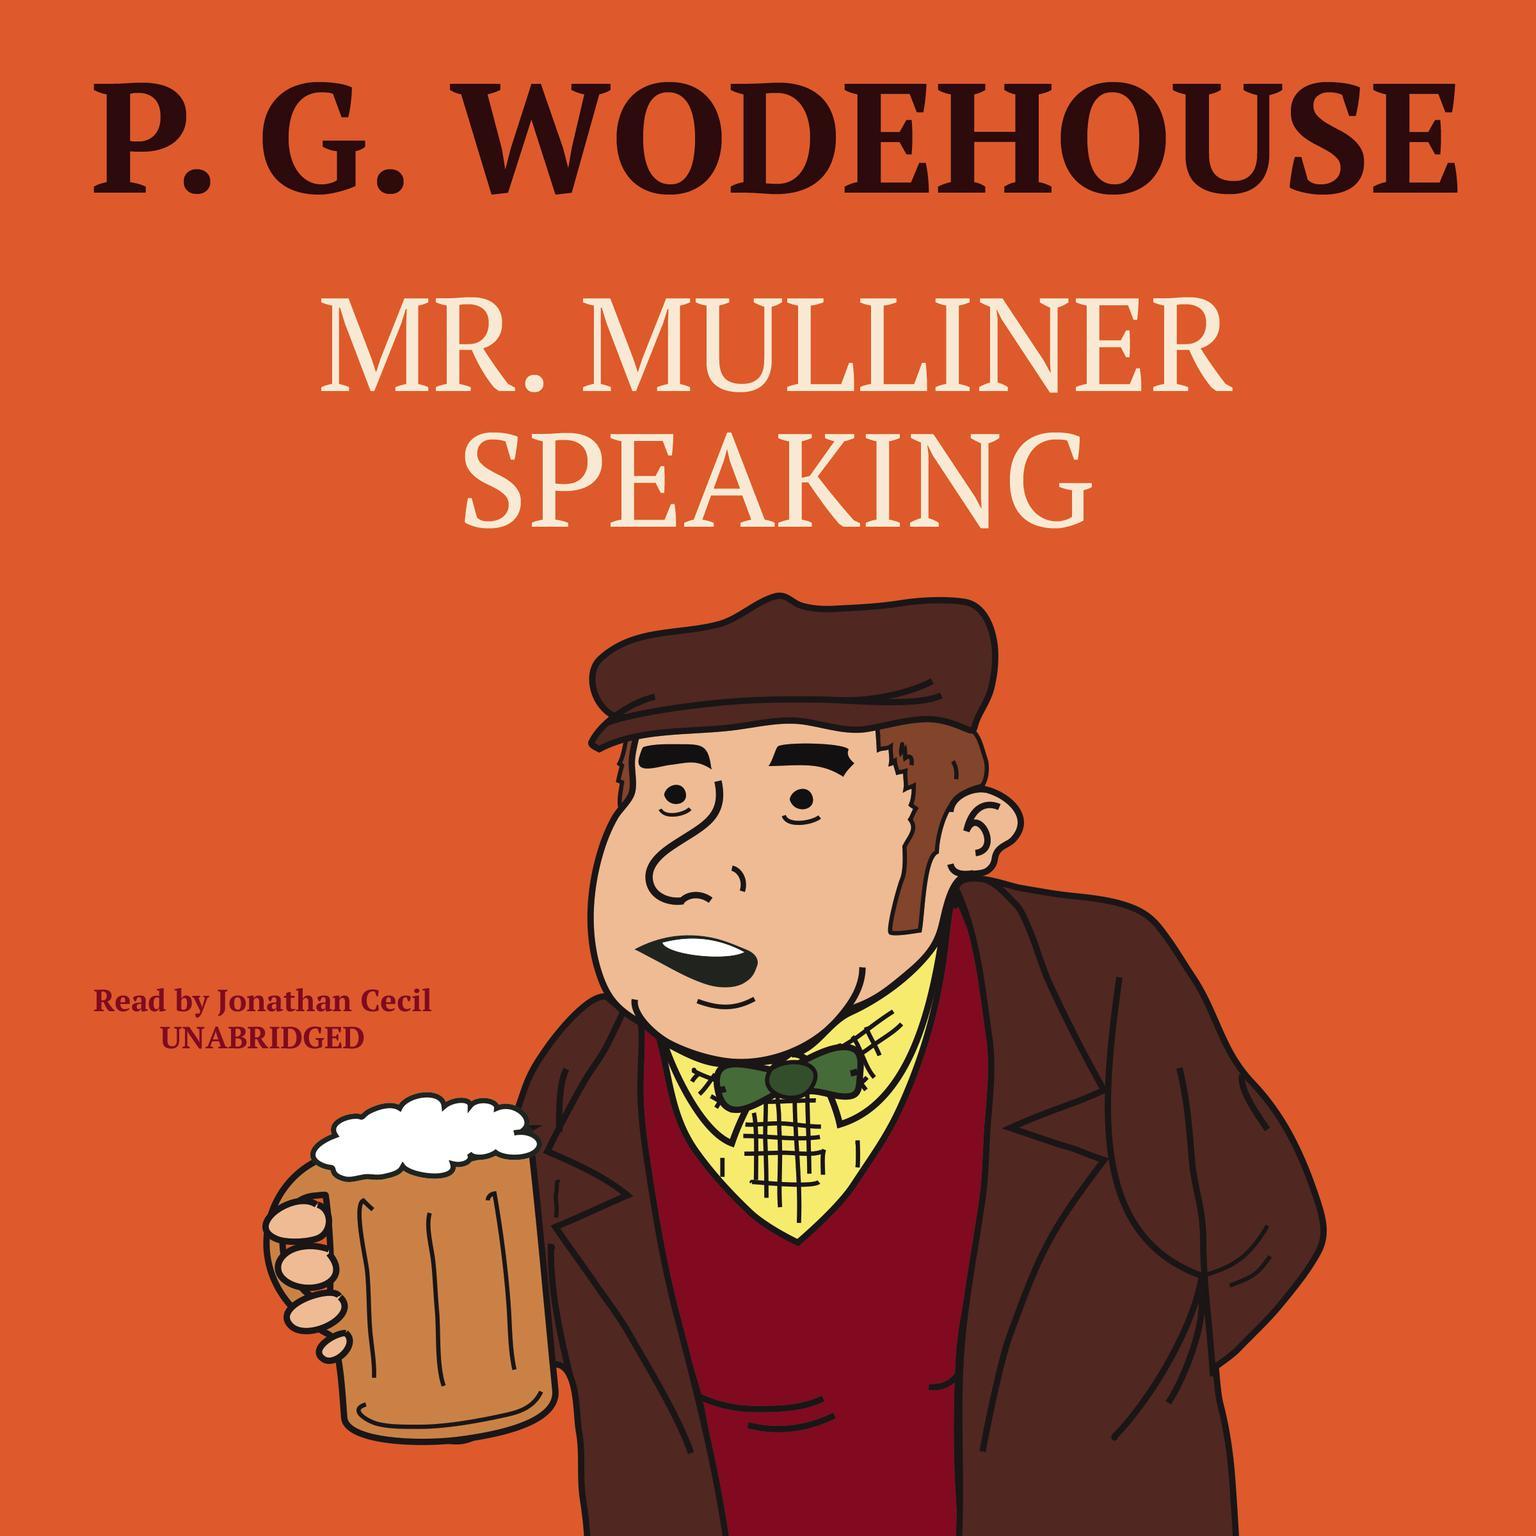 Mr. Mulliner Speaking Audiobook, by P. G. Wodehouse